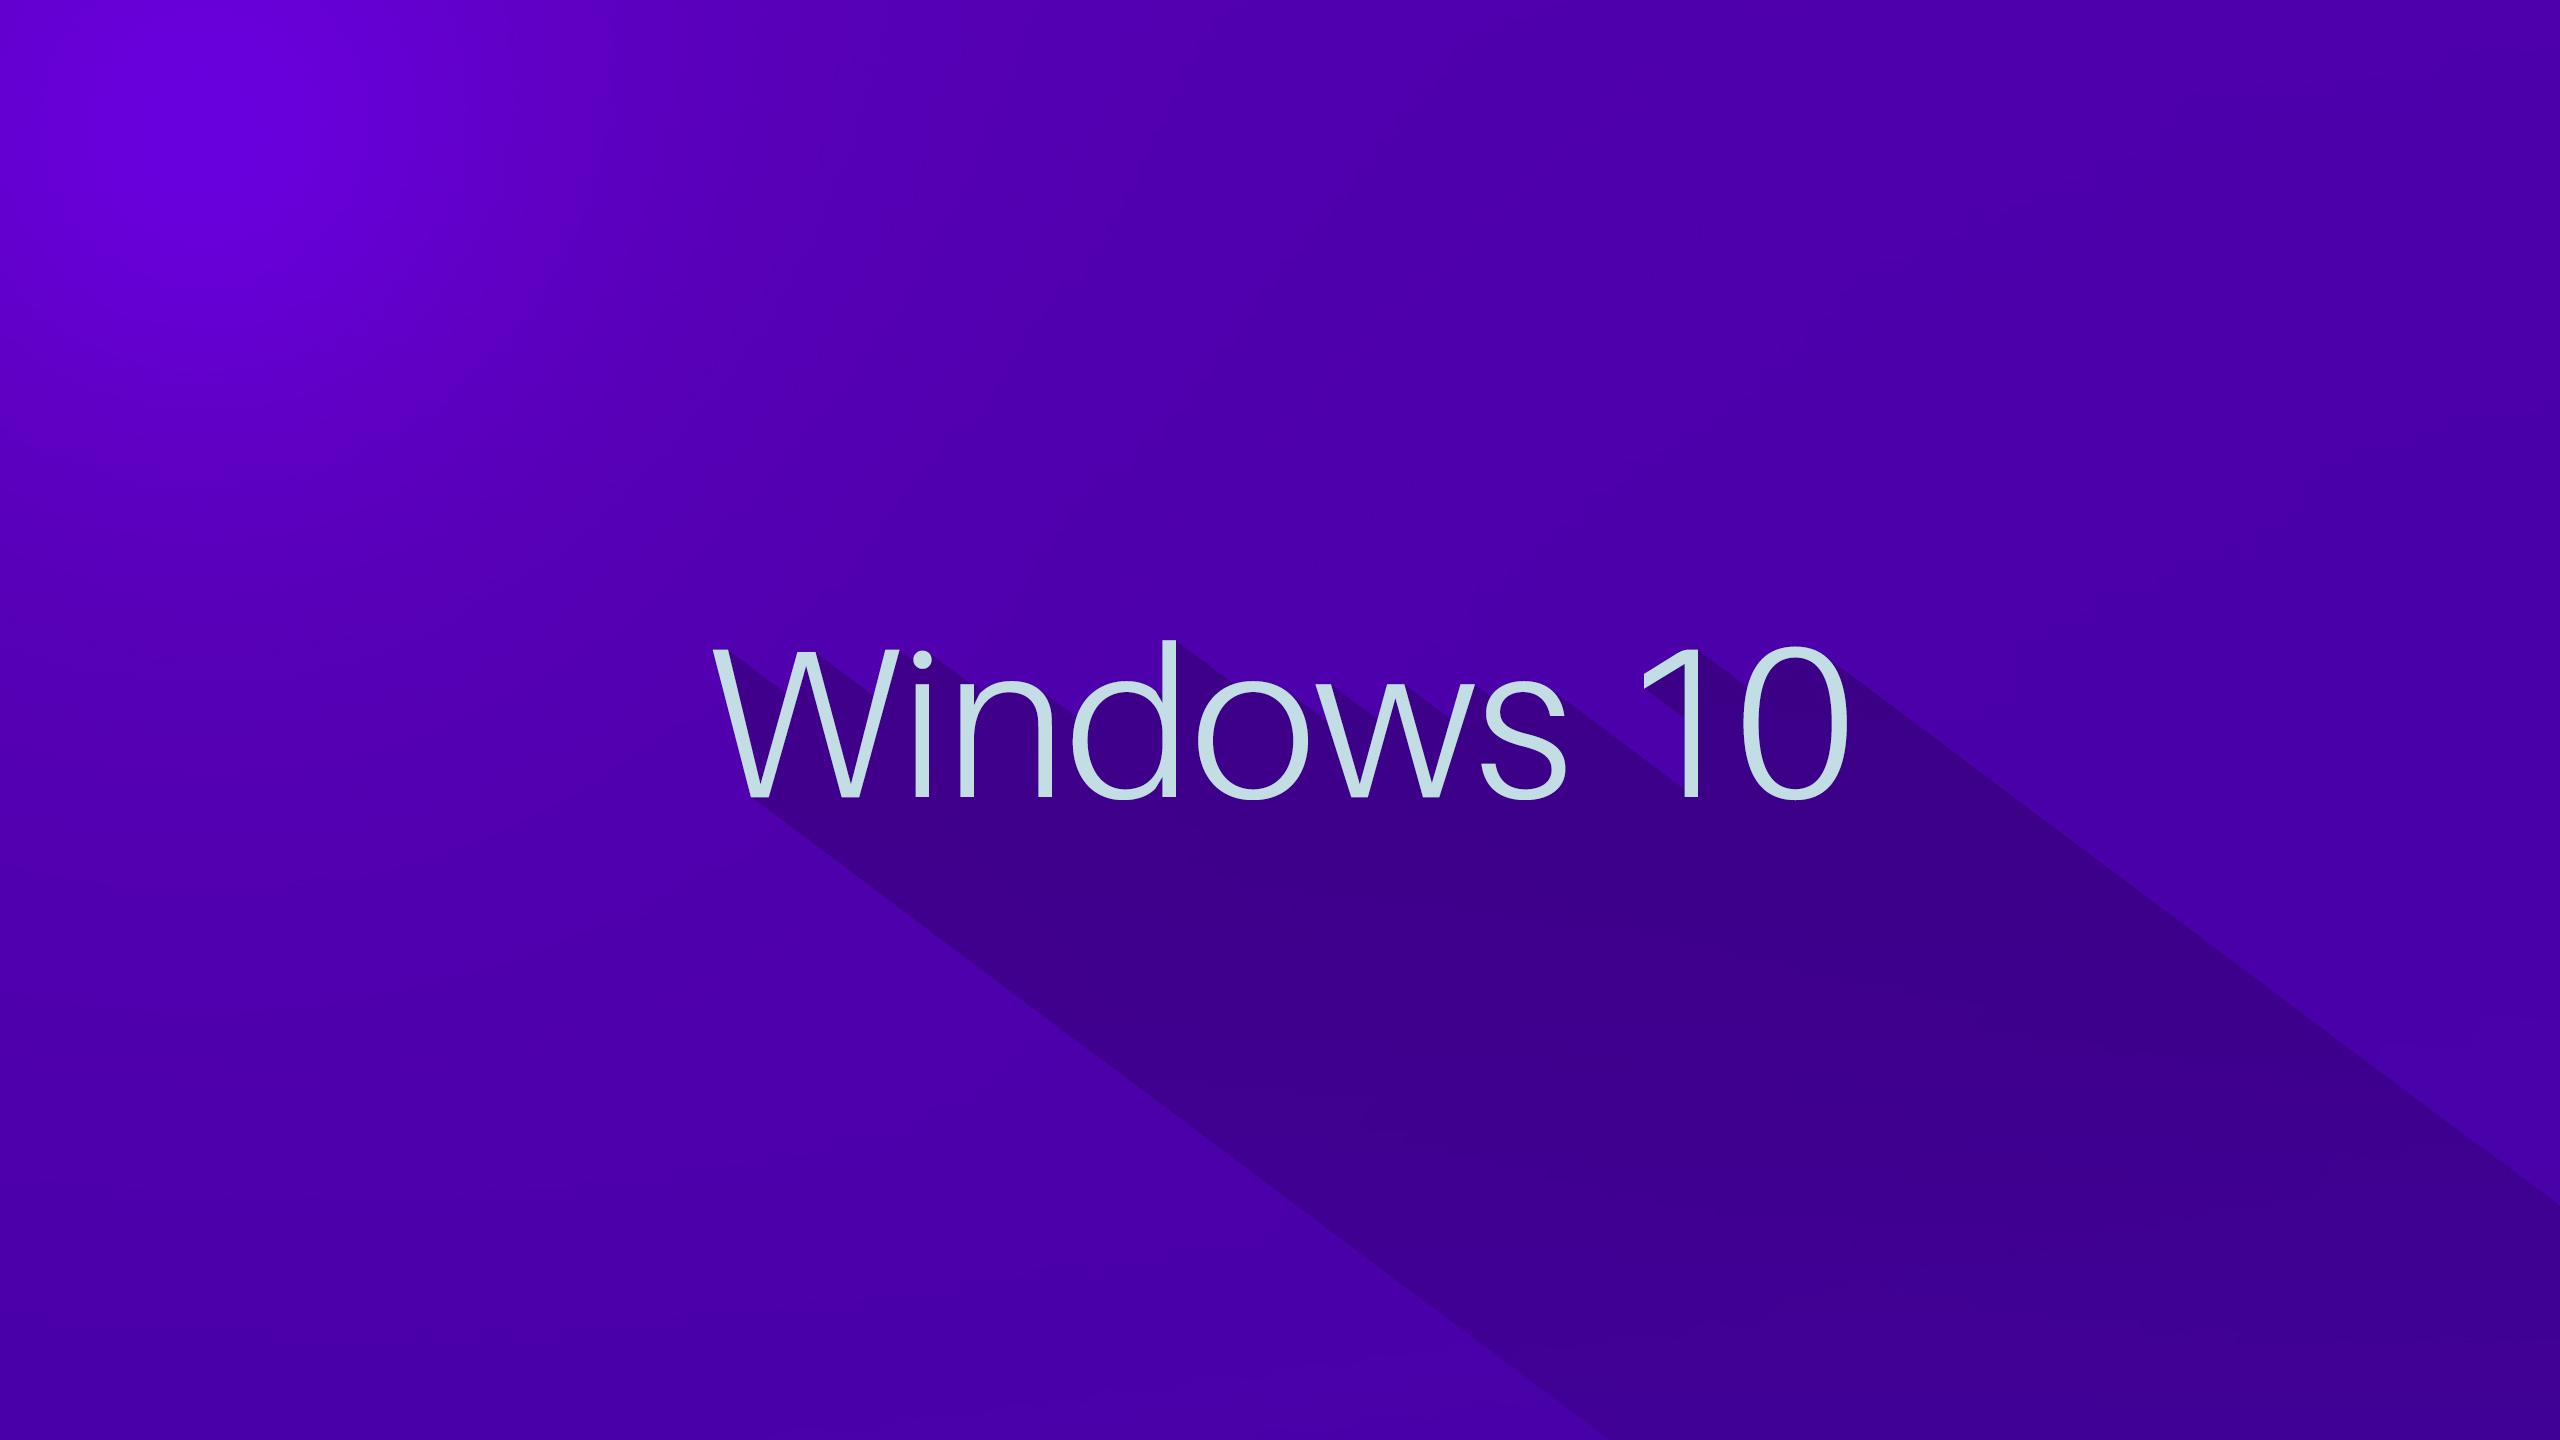 microsoft windows 10 desktop wallpapers attachment 15262 amazing